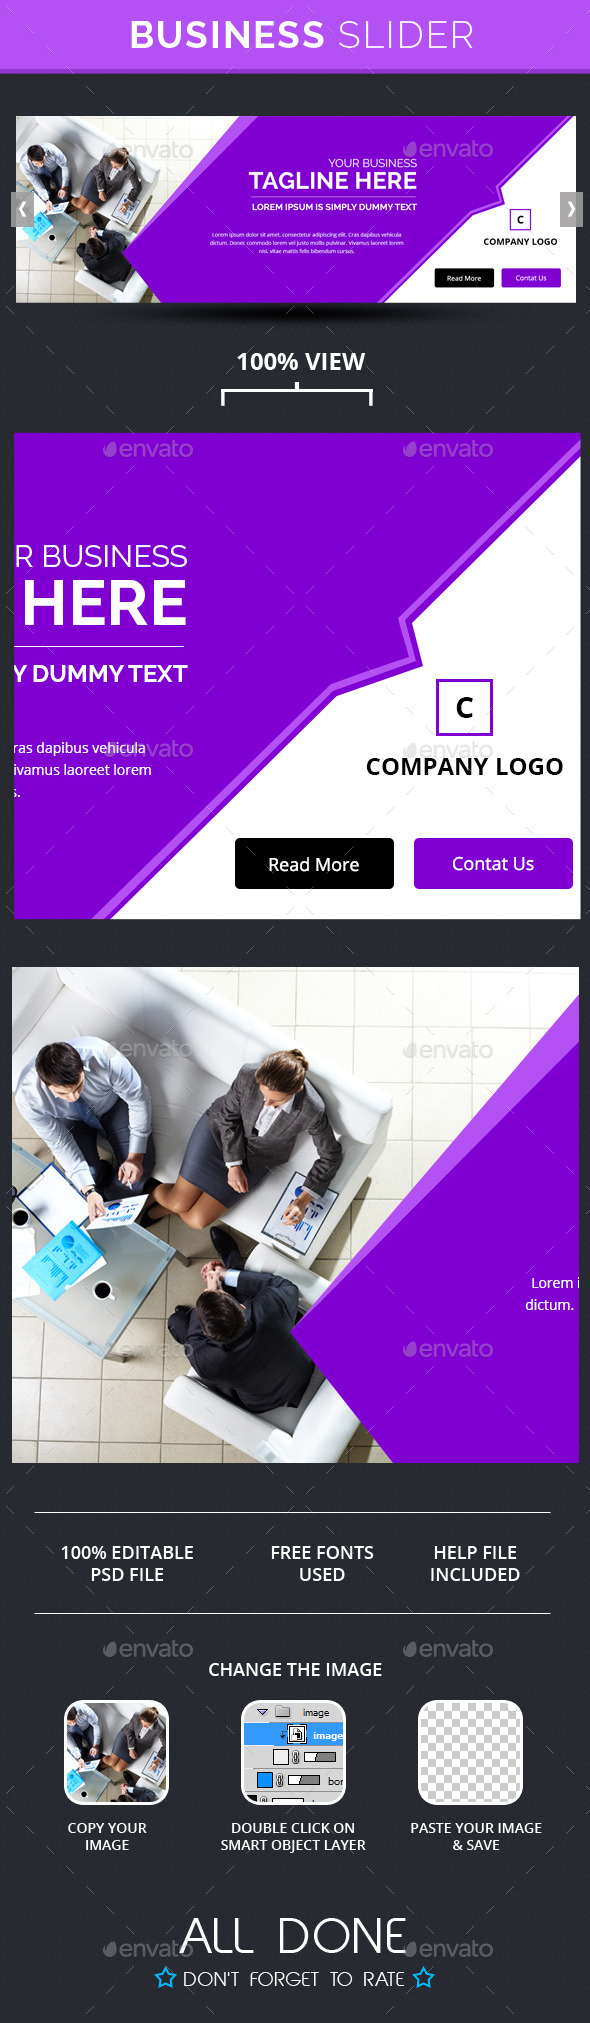 GraphicRiver Business Slide V5 10469354